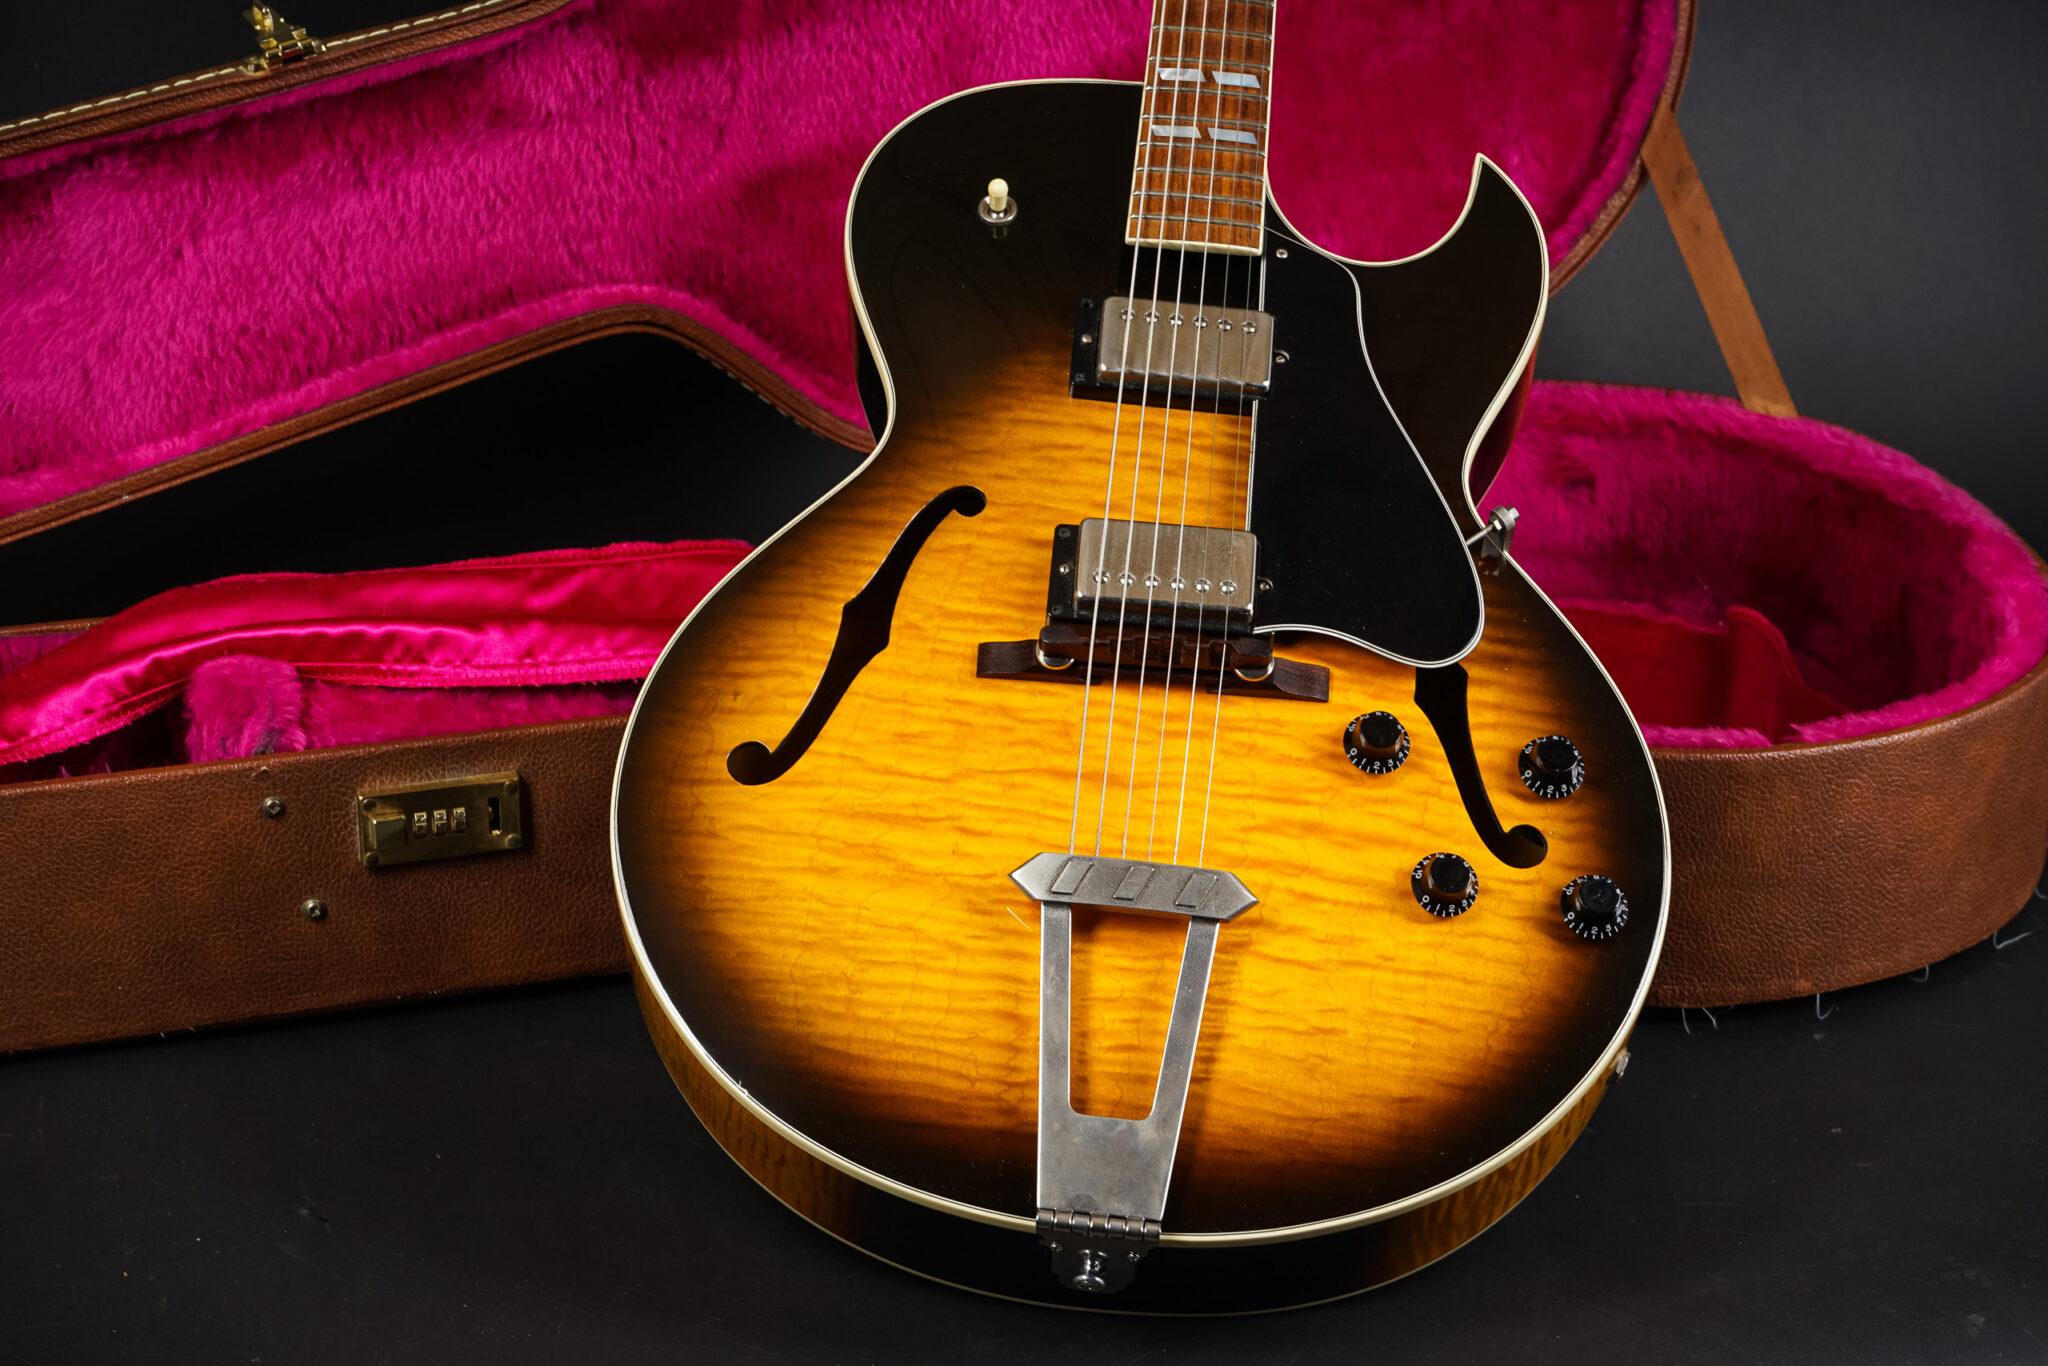 https://guitarpoint.de/app/uploads/products/1995-gibson-es-175-d-92795312/1995-Gibson-ES175D-Sunburst-11-2048x1366.jpg